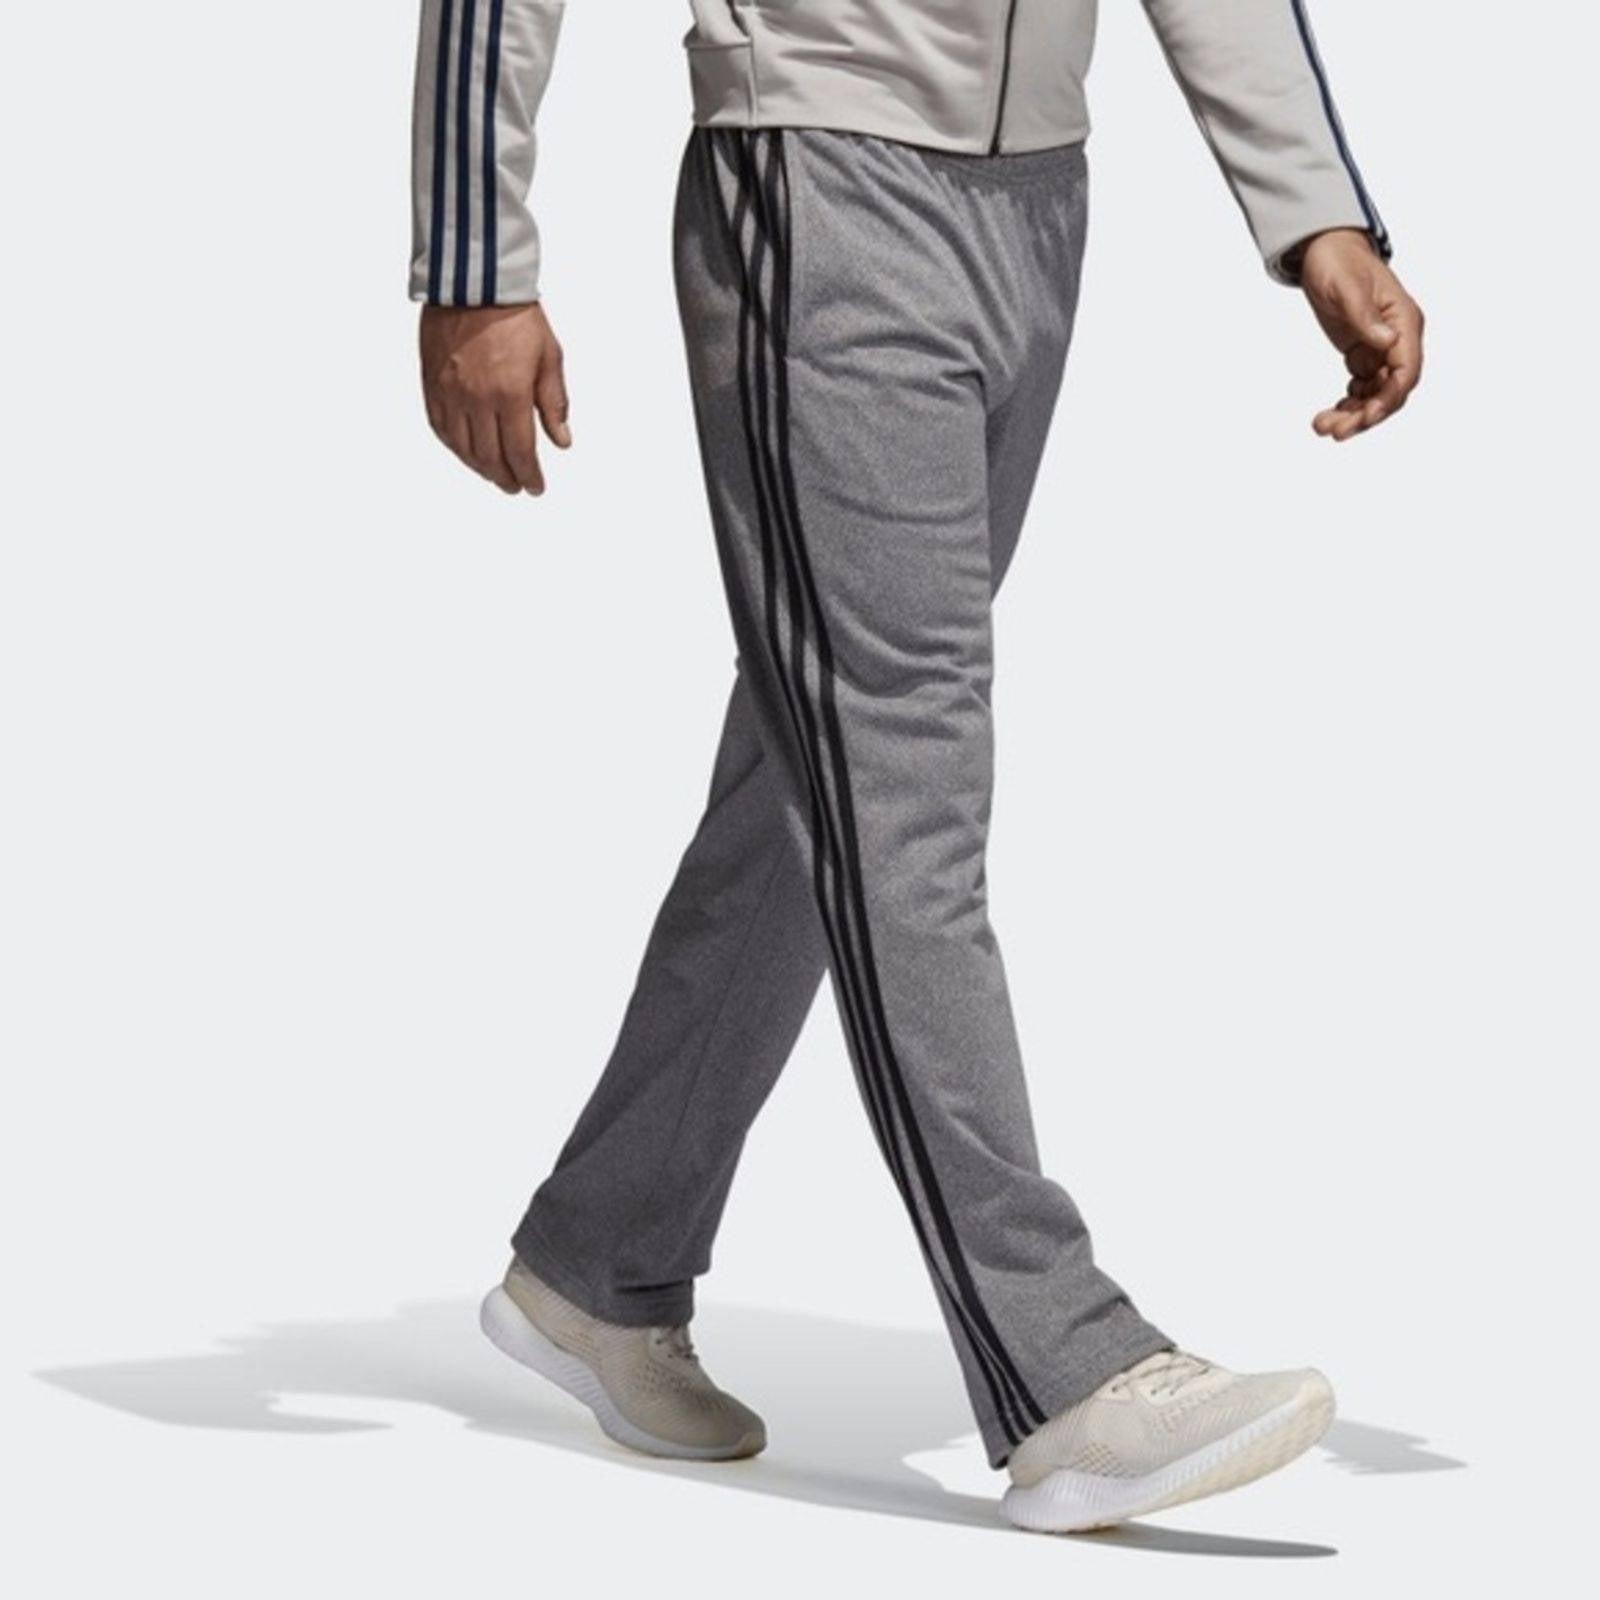 Adidas Tricot Sweatpants Athletic Pants